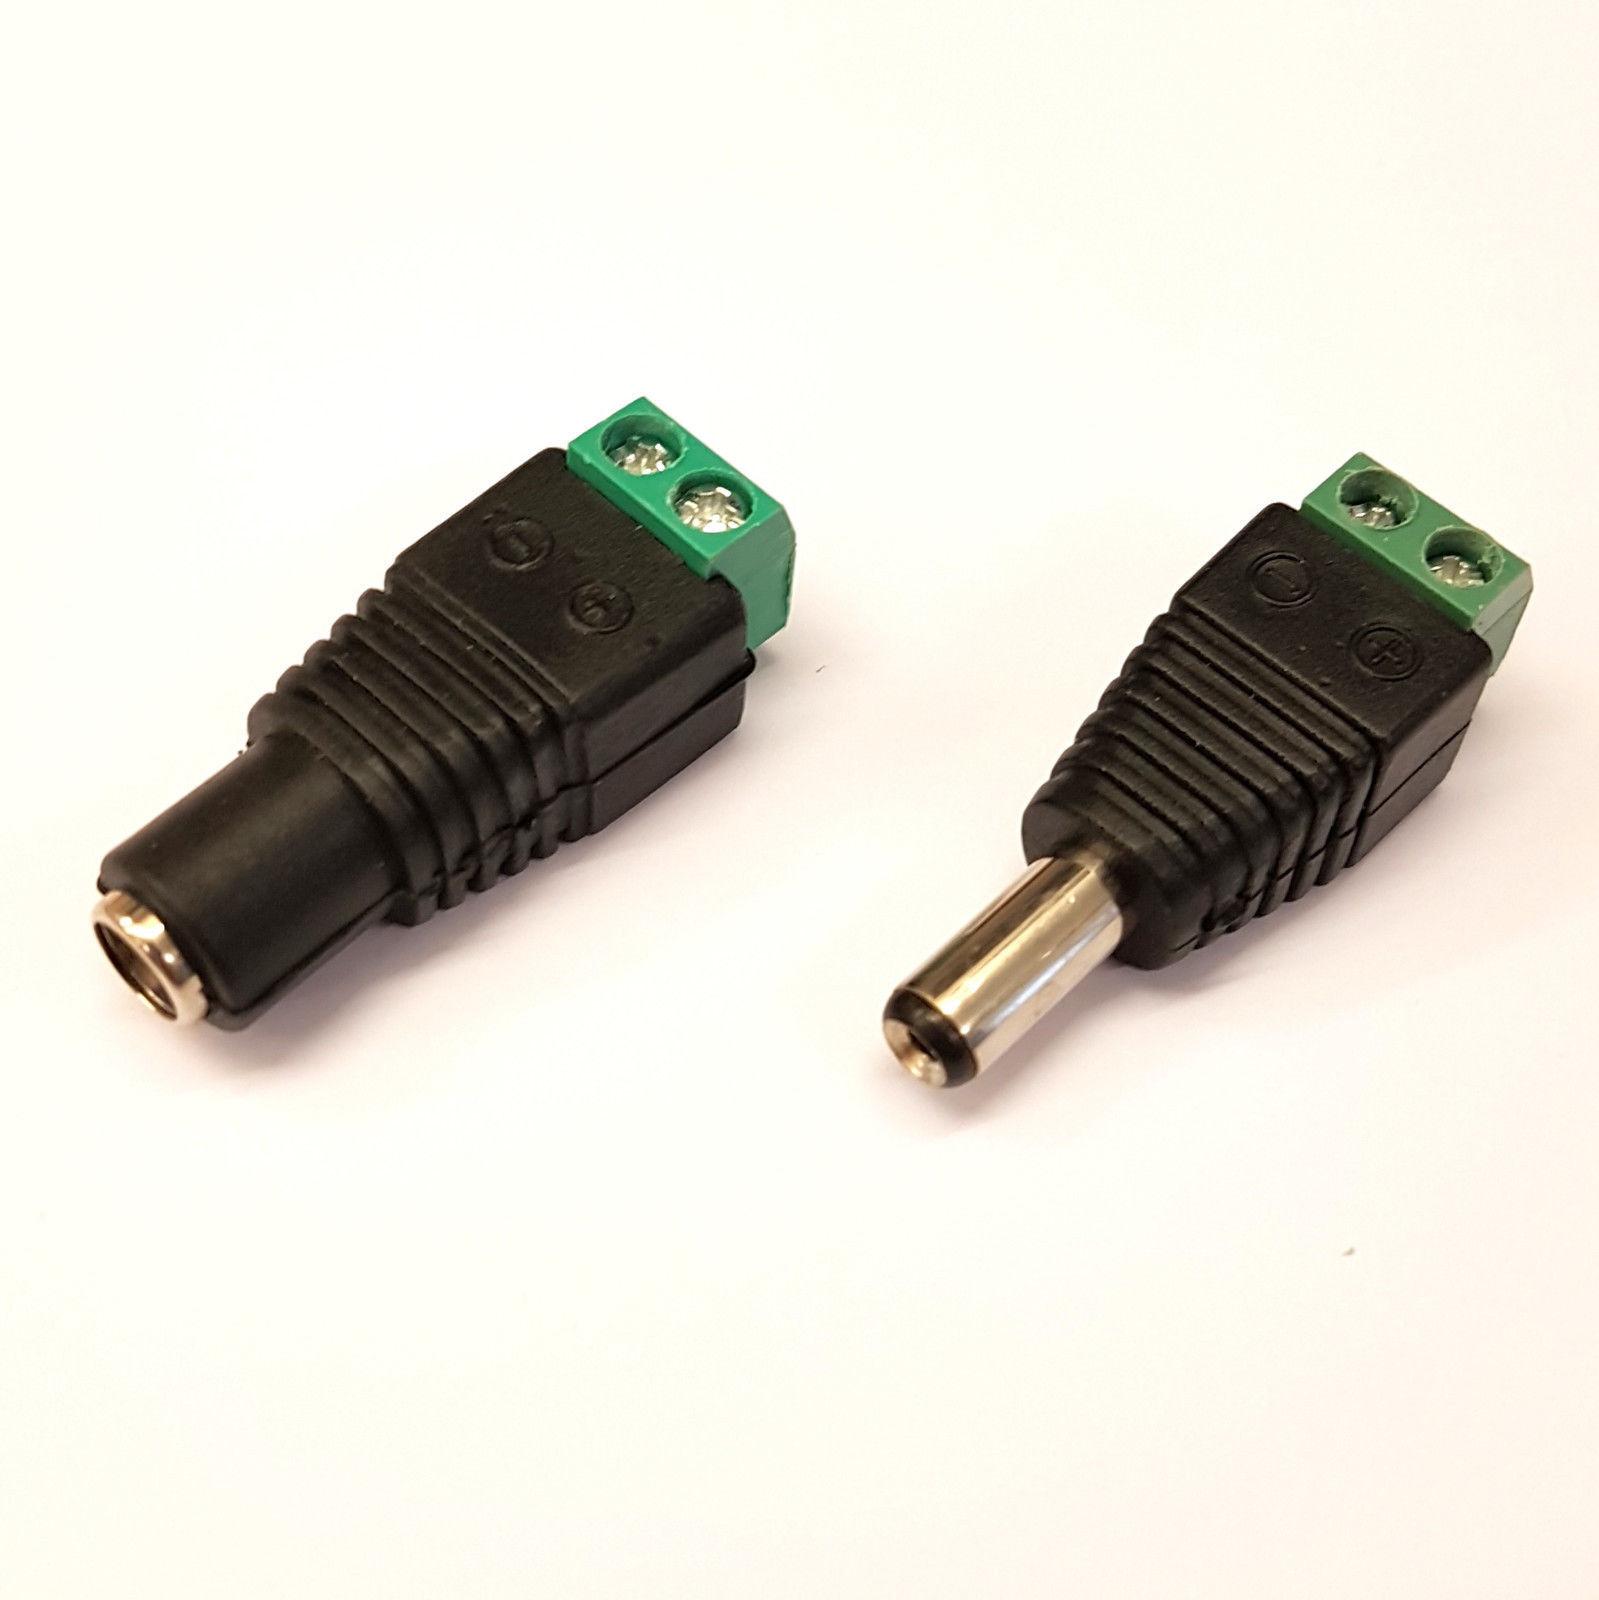 PLUGZ2GO 5 x DC Power Plug 2.5 x 5.5mm Jack Connector Male 9mm